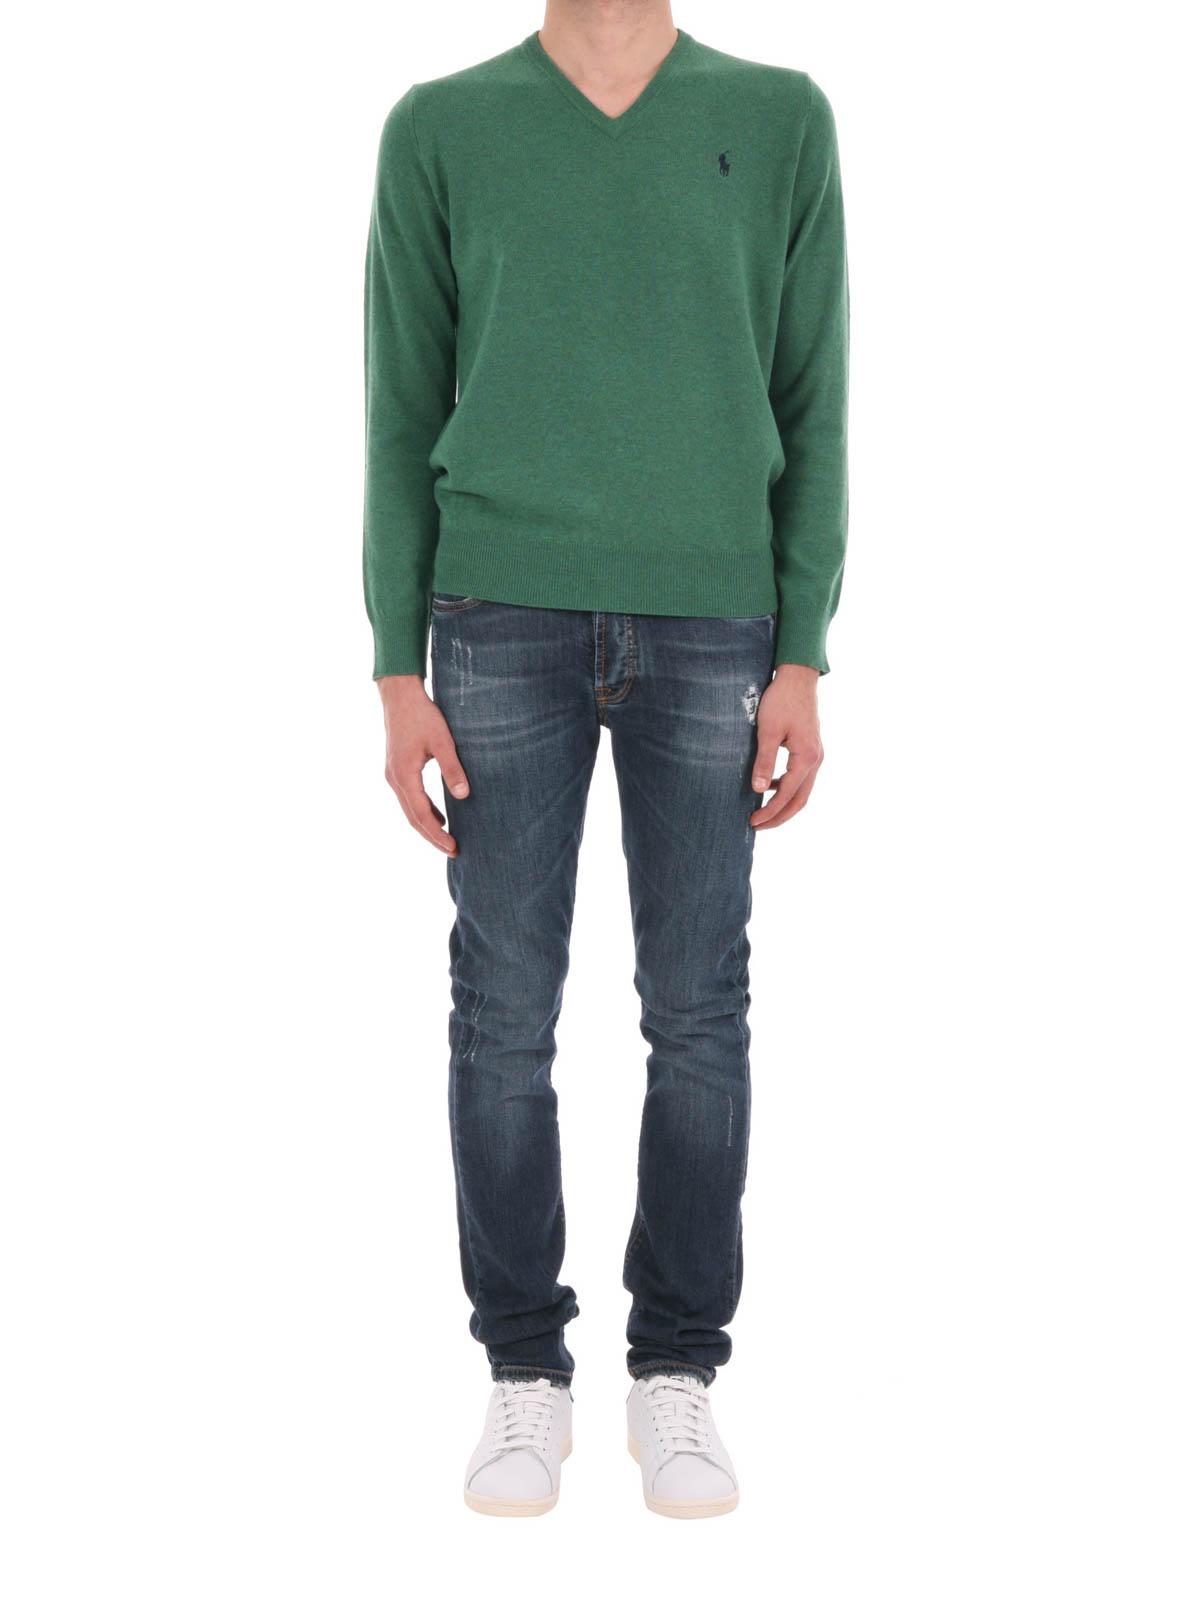 Polo Ralph Lauren - T-Shirt À Col V Vert Clair - Col en V - A42SVN13 ... 9ee8195c5259